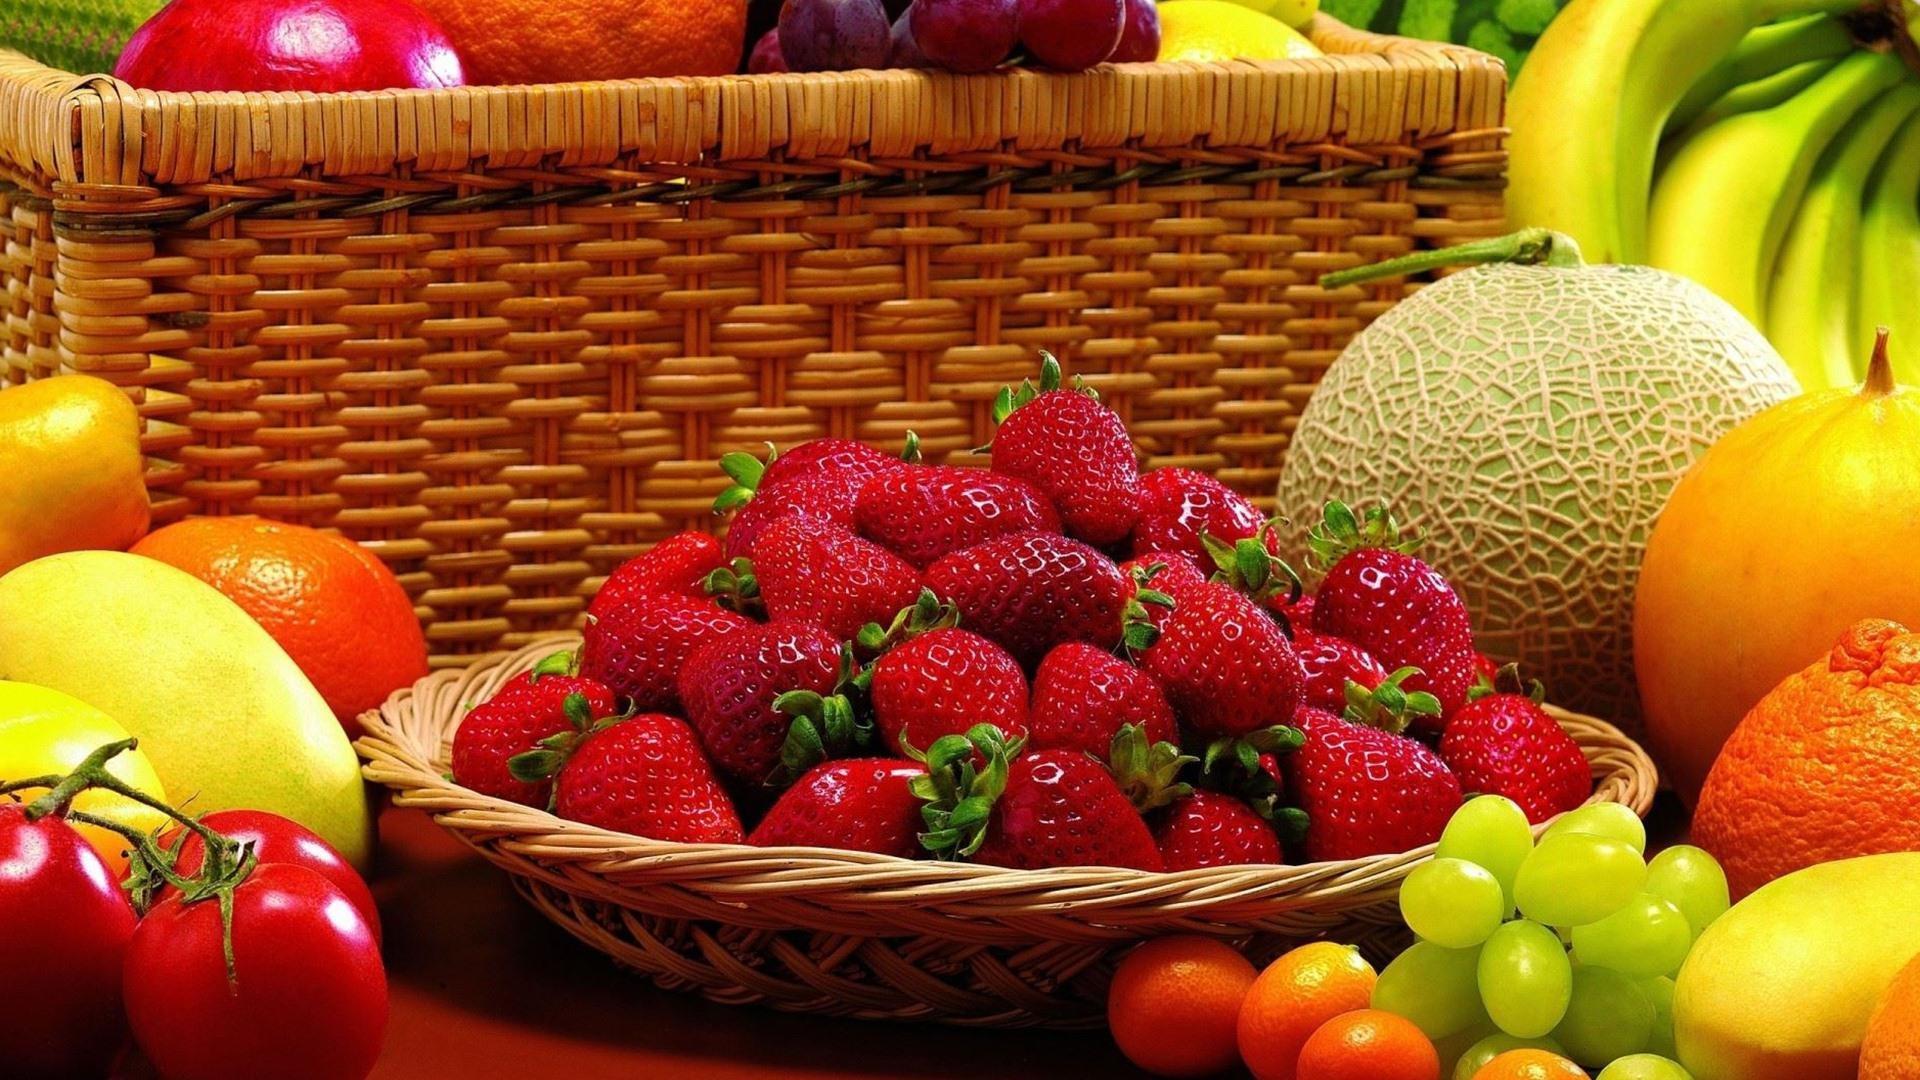 Food Wallpaper Background (71+ Images